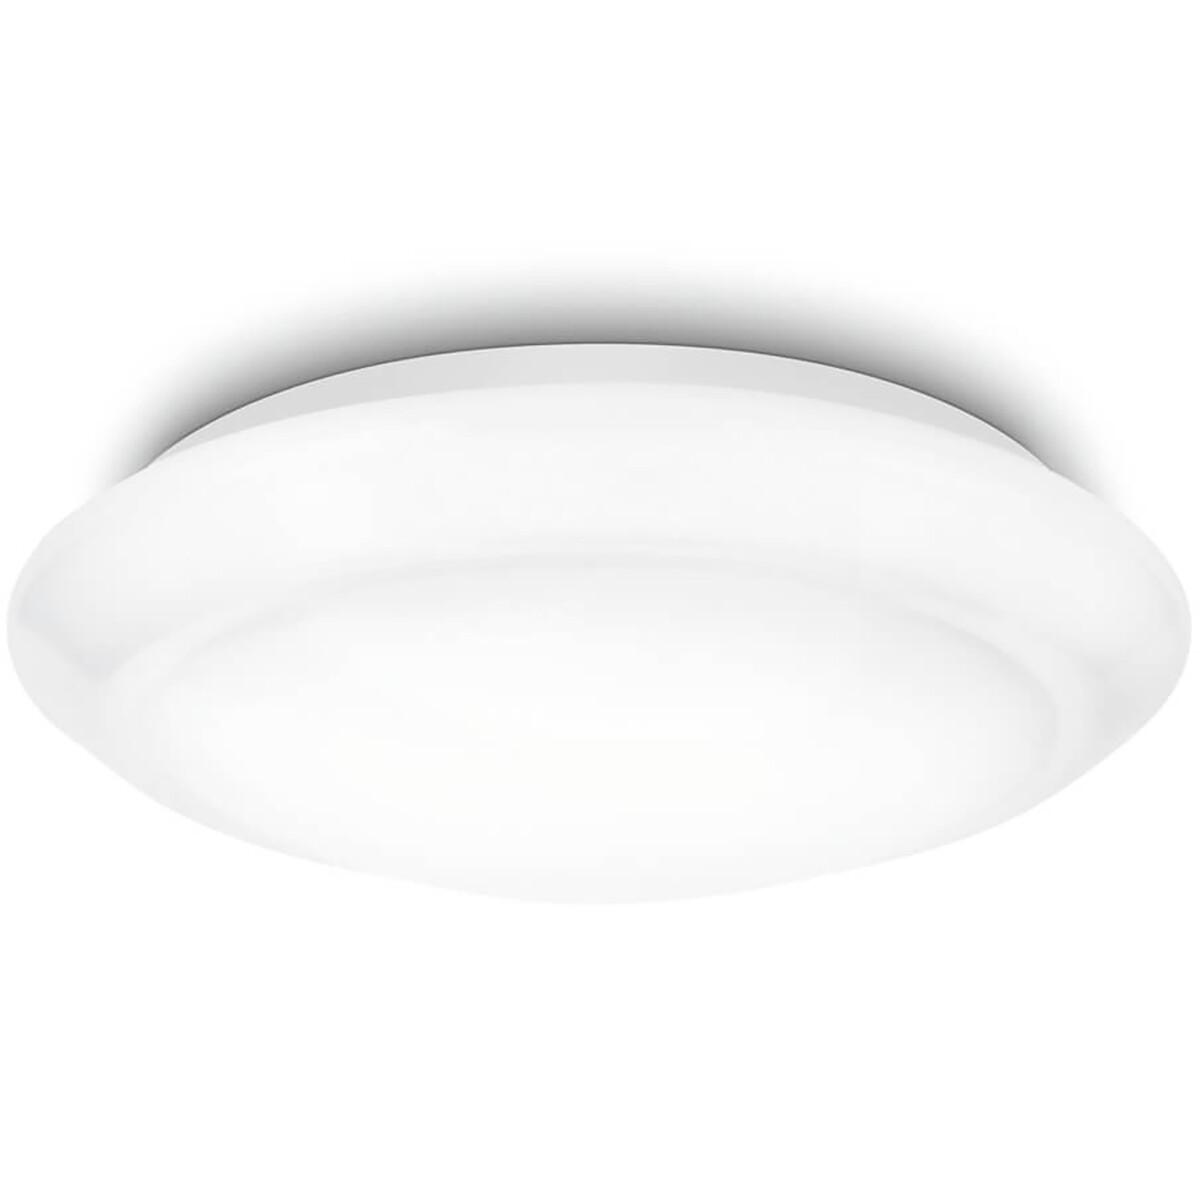 Cinnabar plafondlamp wit by Philips 333613116